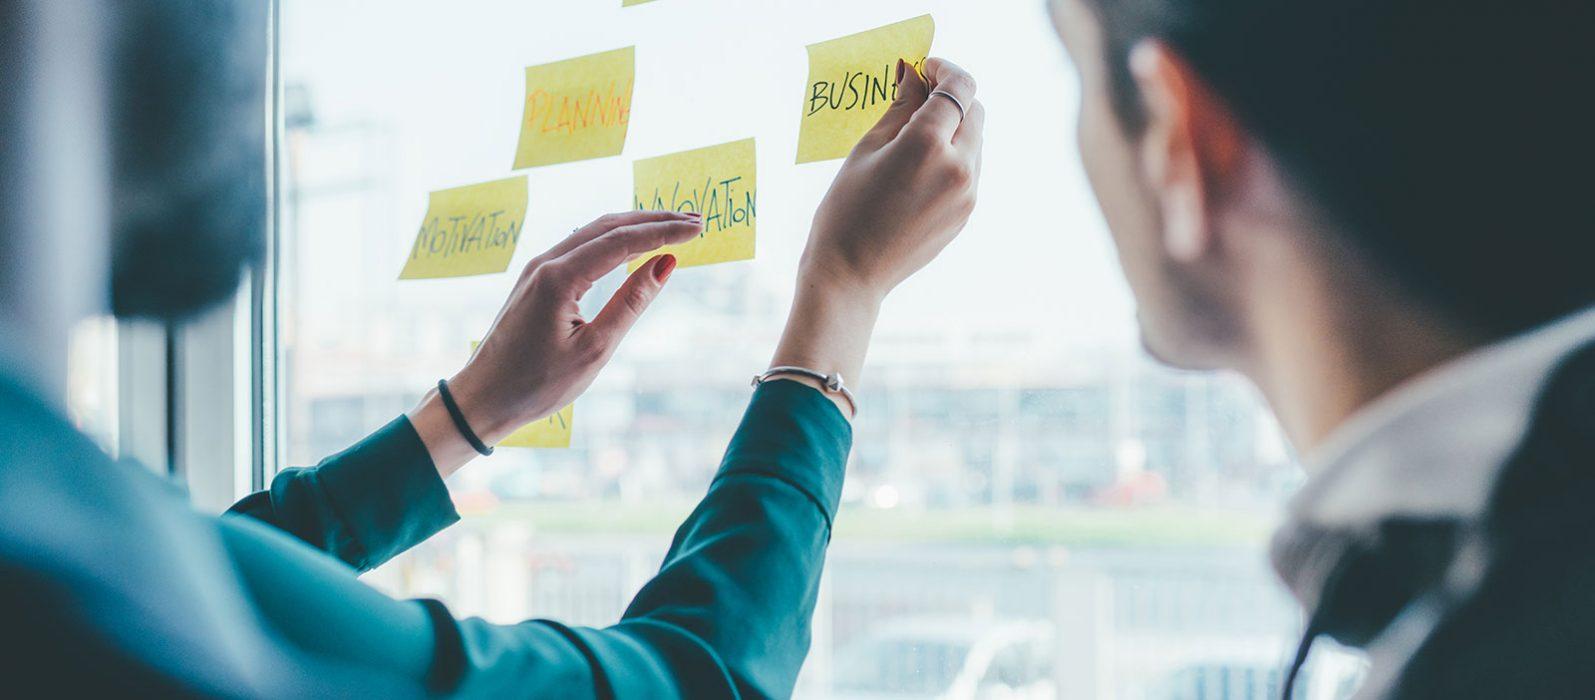 cursos de inteligencia emocional para empresas